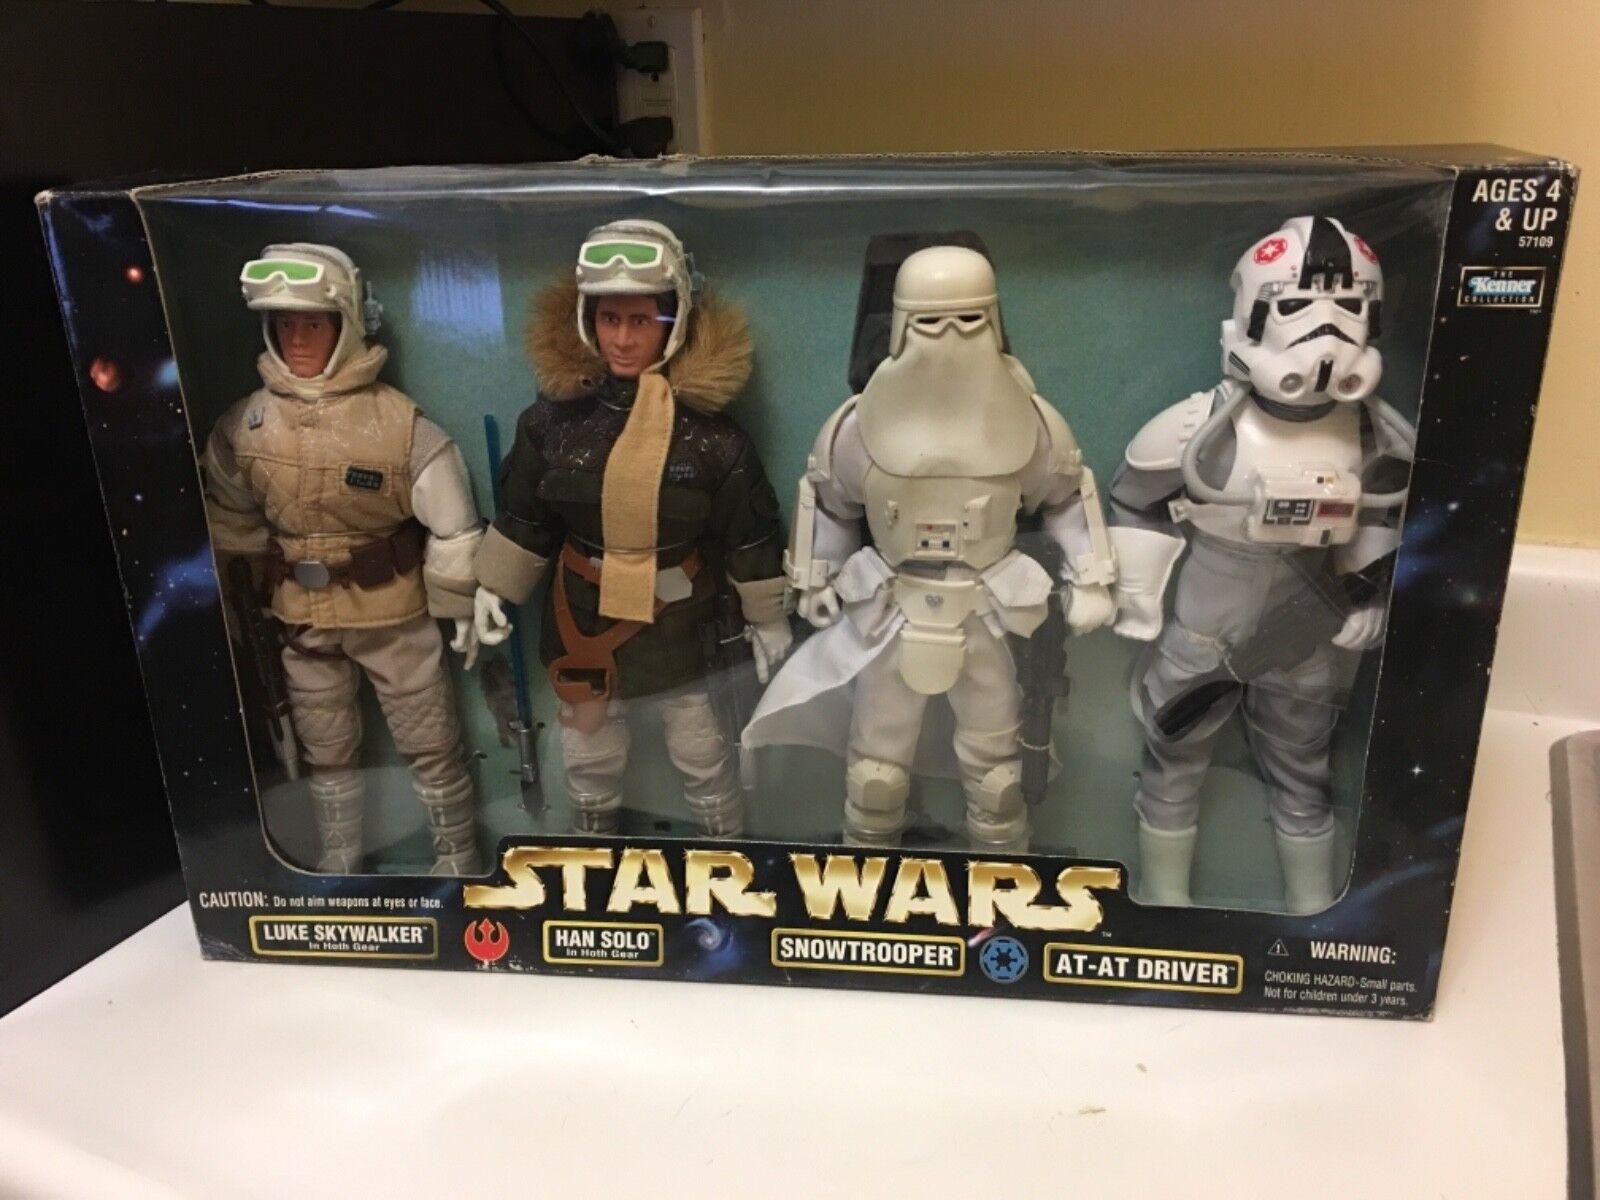 Hasbro - star - wars - aktion sammlung luke skywalker, han solo, snowtrooper, bei dri